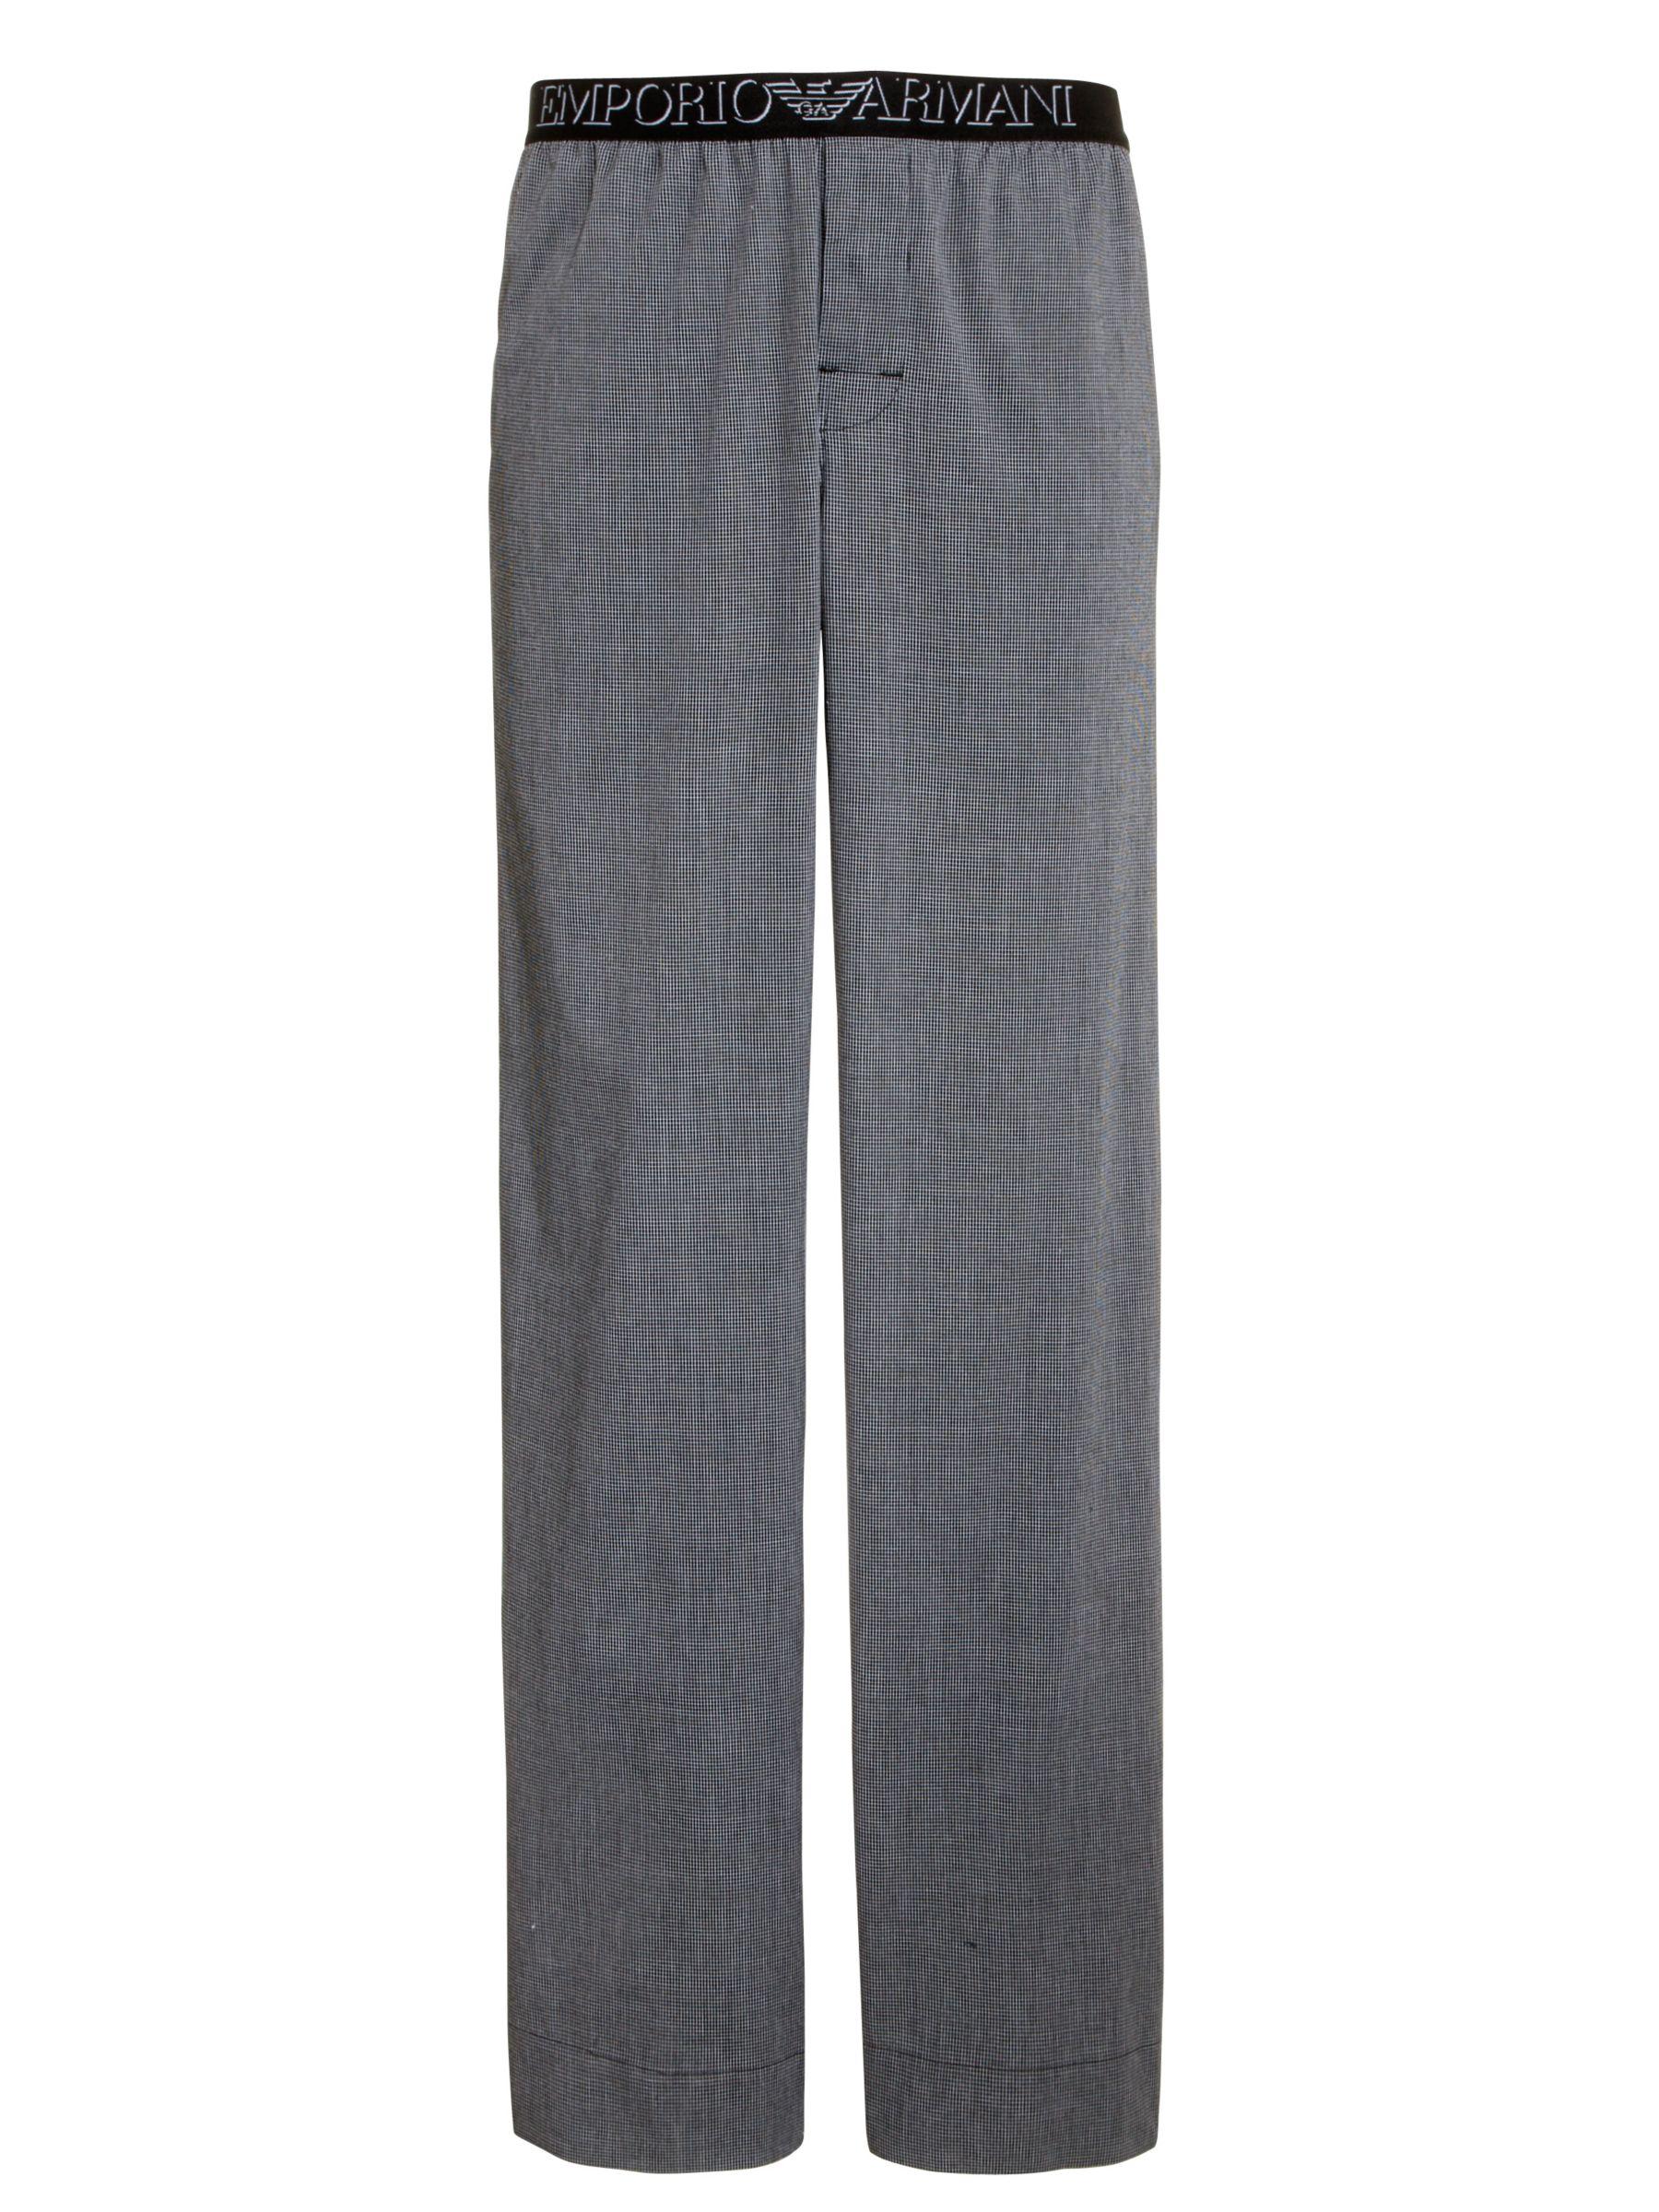 Emporio Armani Check Pyjama Bottoms, Grey